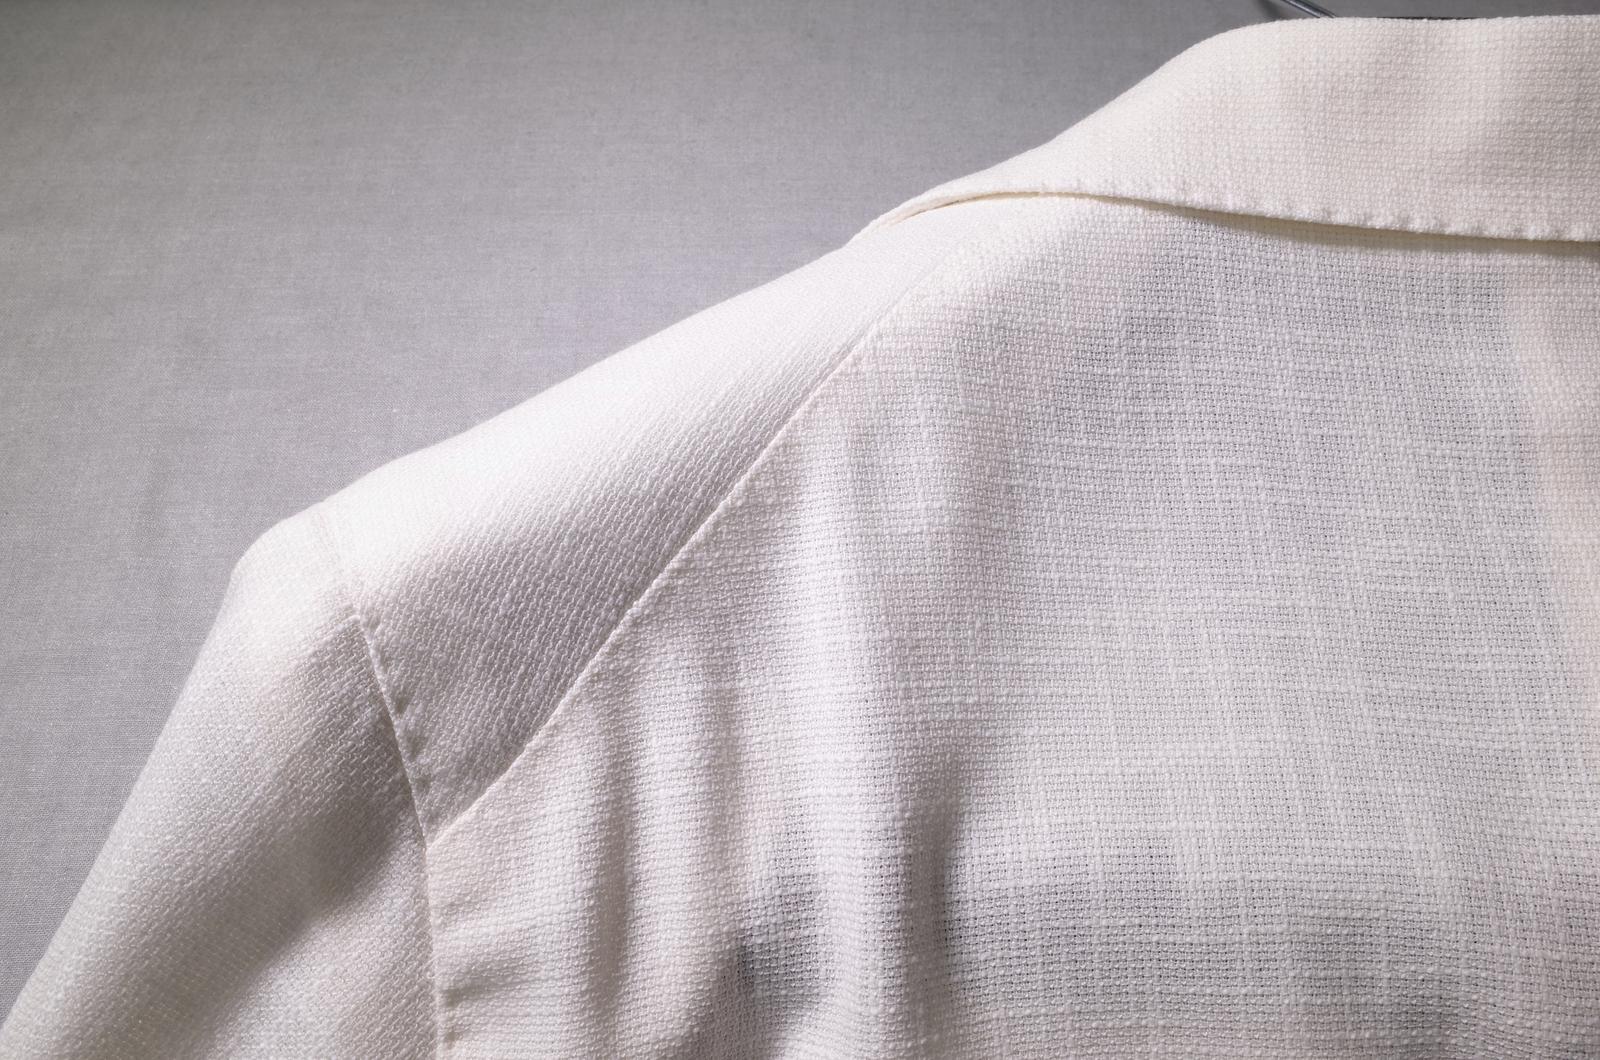 f:id:suits:20200724220828j:plain